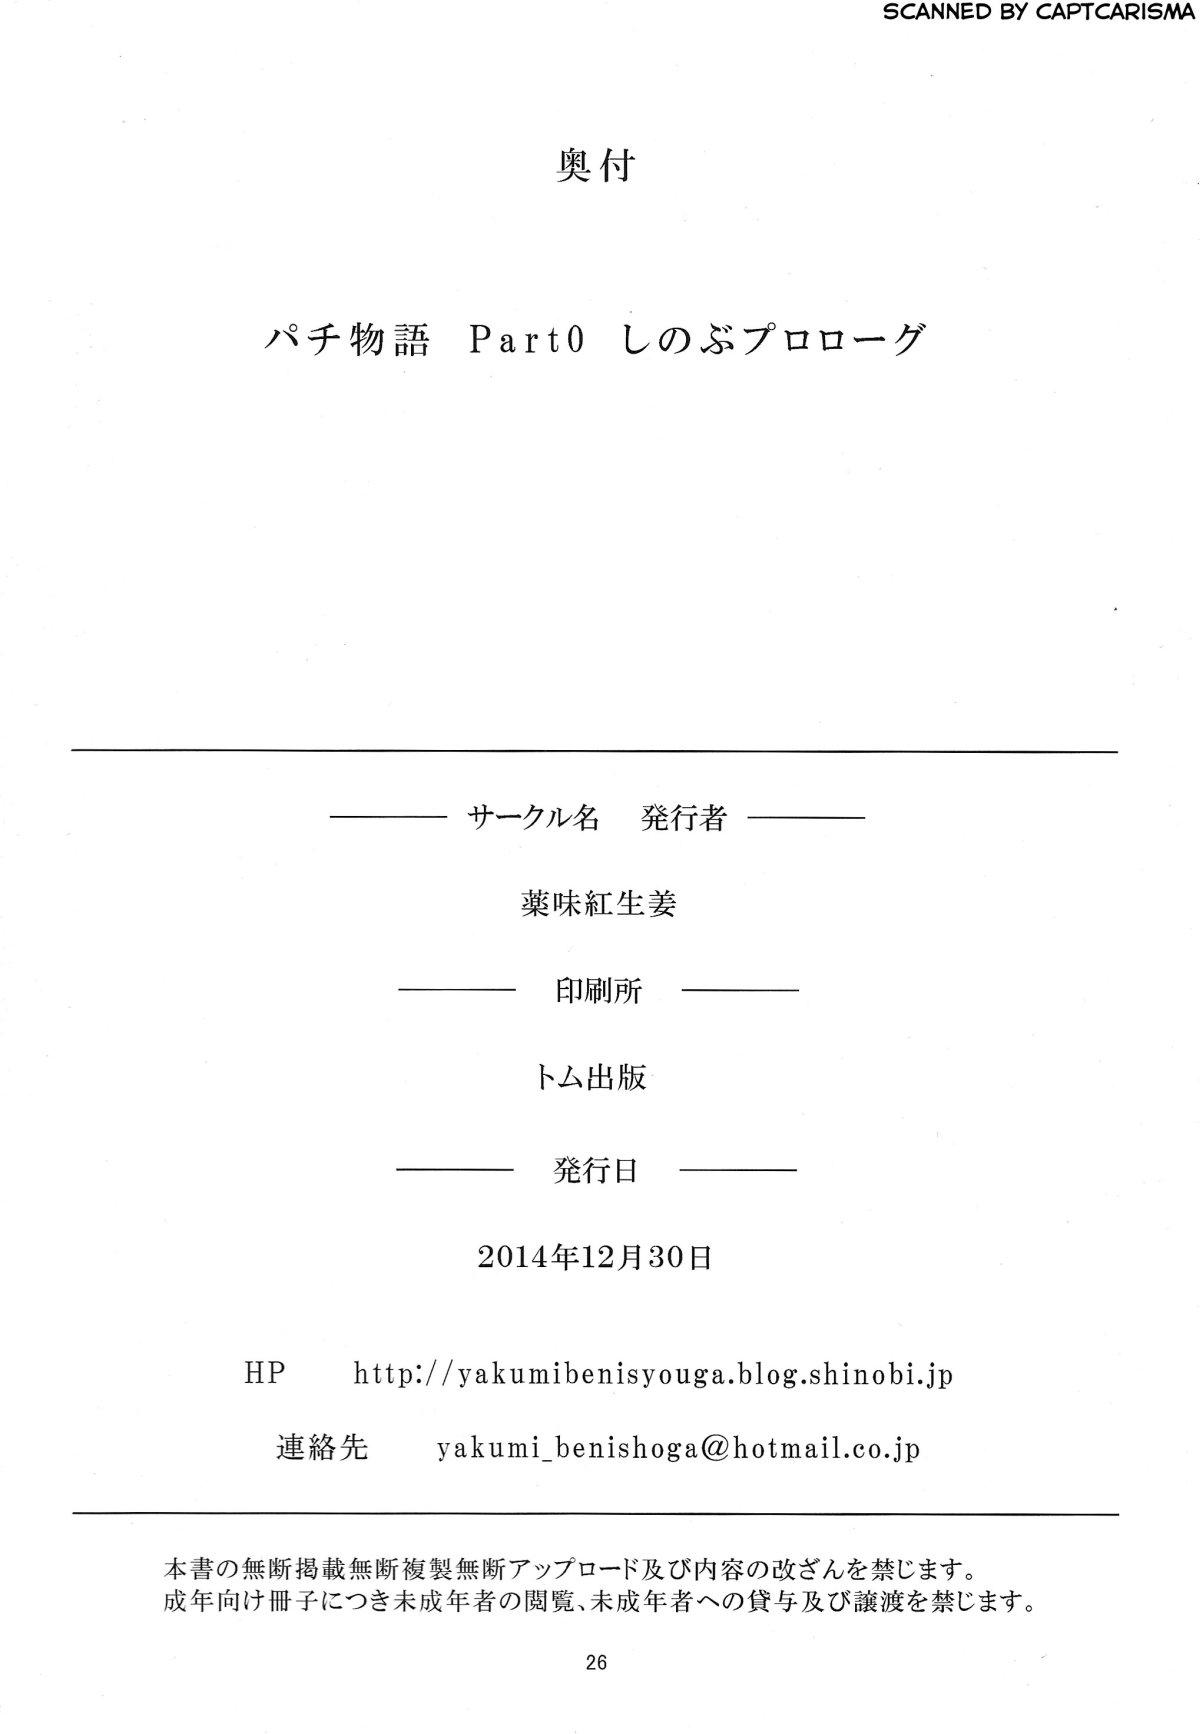 Hình ảnh  in Pachimonogatari Shinobu Monologue